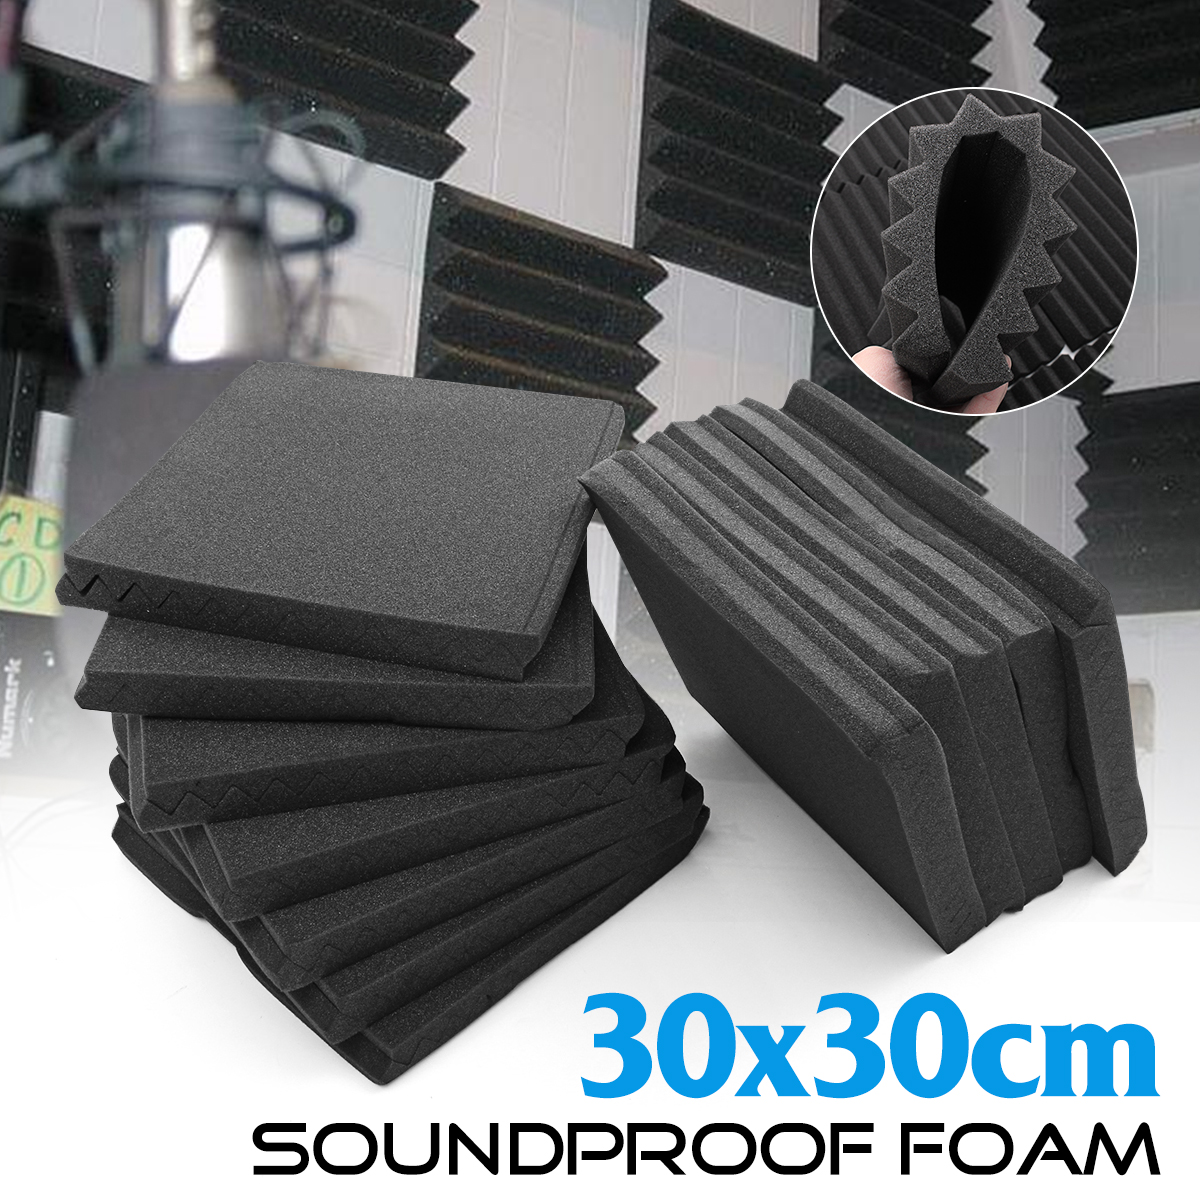 24Pcs 30x30cm Soundproofing Foam Acoustic Sponge Foam Treatment Studio Room Noise Absorption Wedge Tiles Polyurethane Foam foam